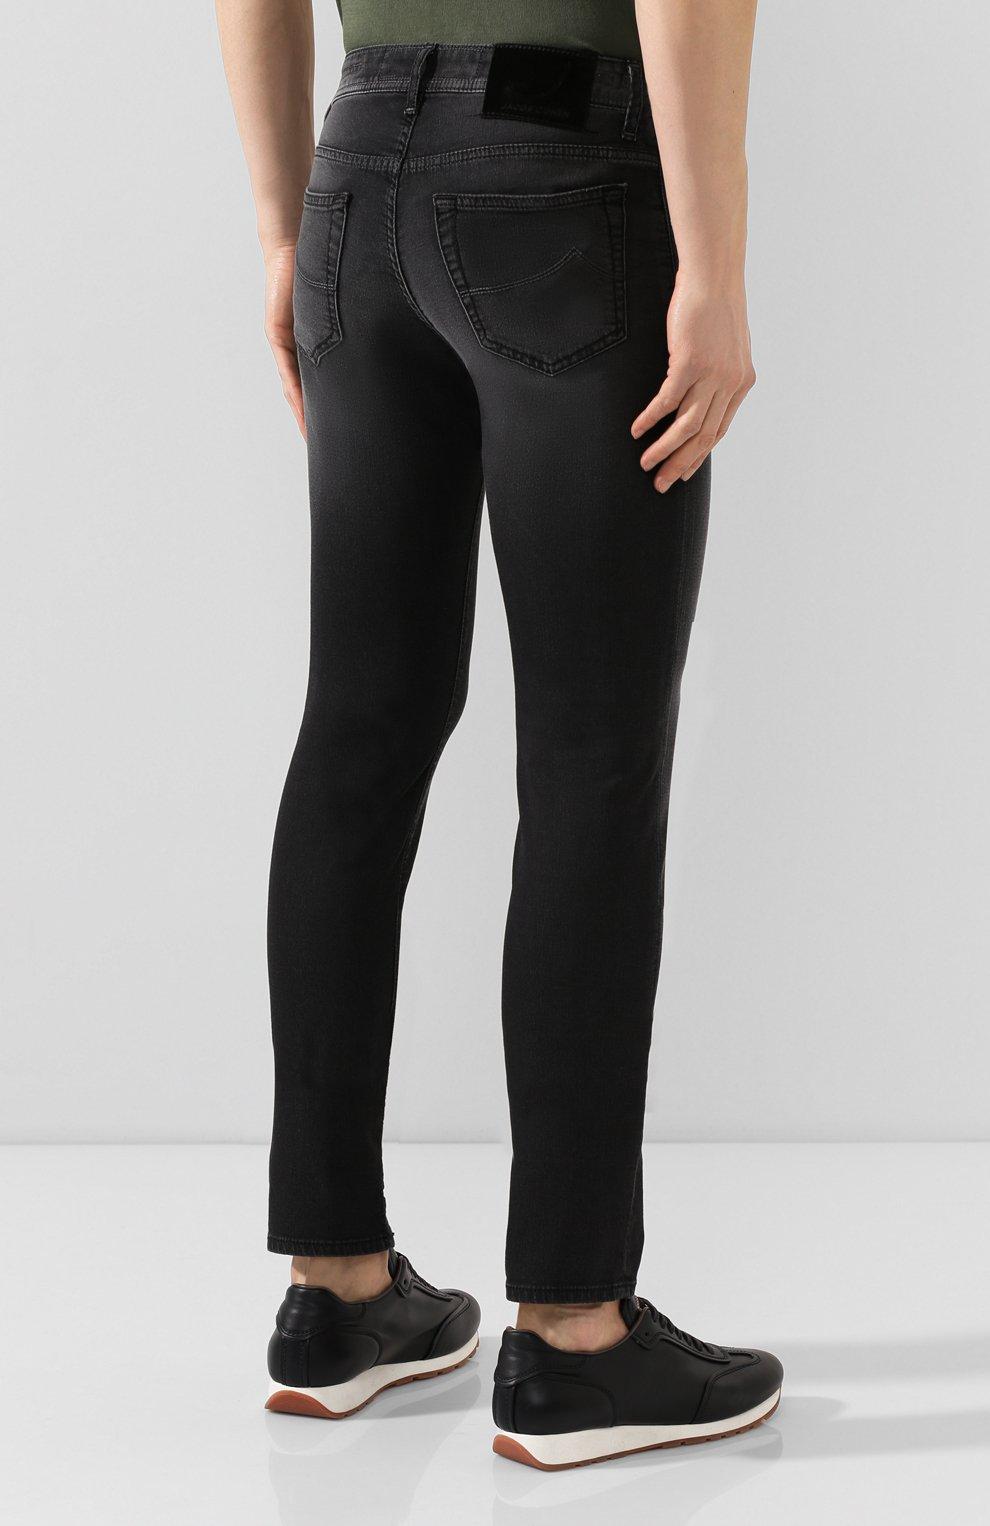 Мужские джинсы JACOB COHEN черного цвета, арт. J688 C0MF 01841-W1/53   Фото 4